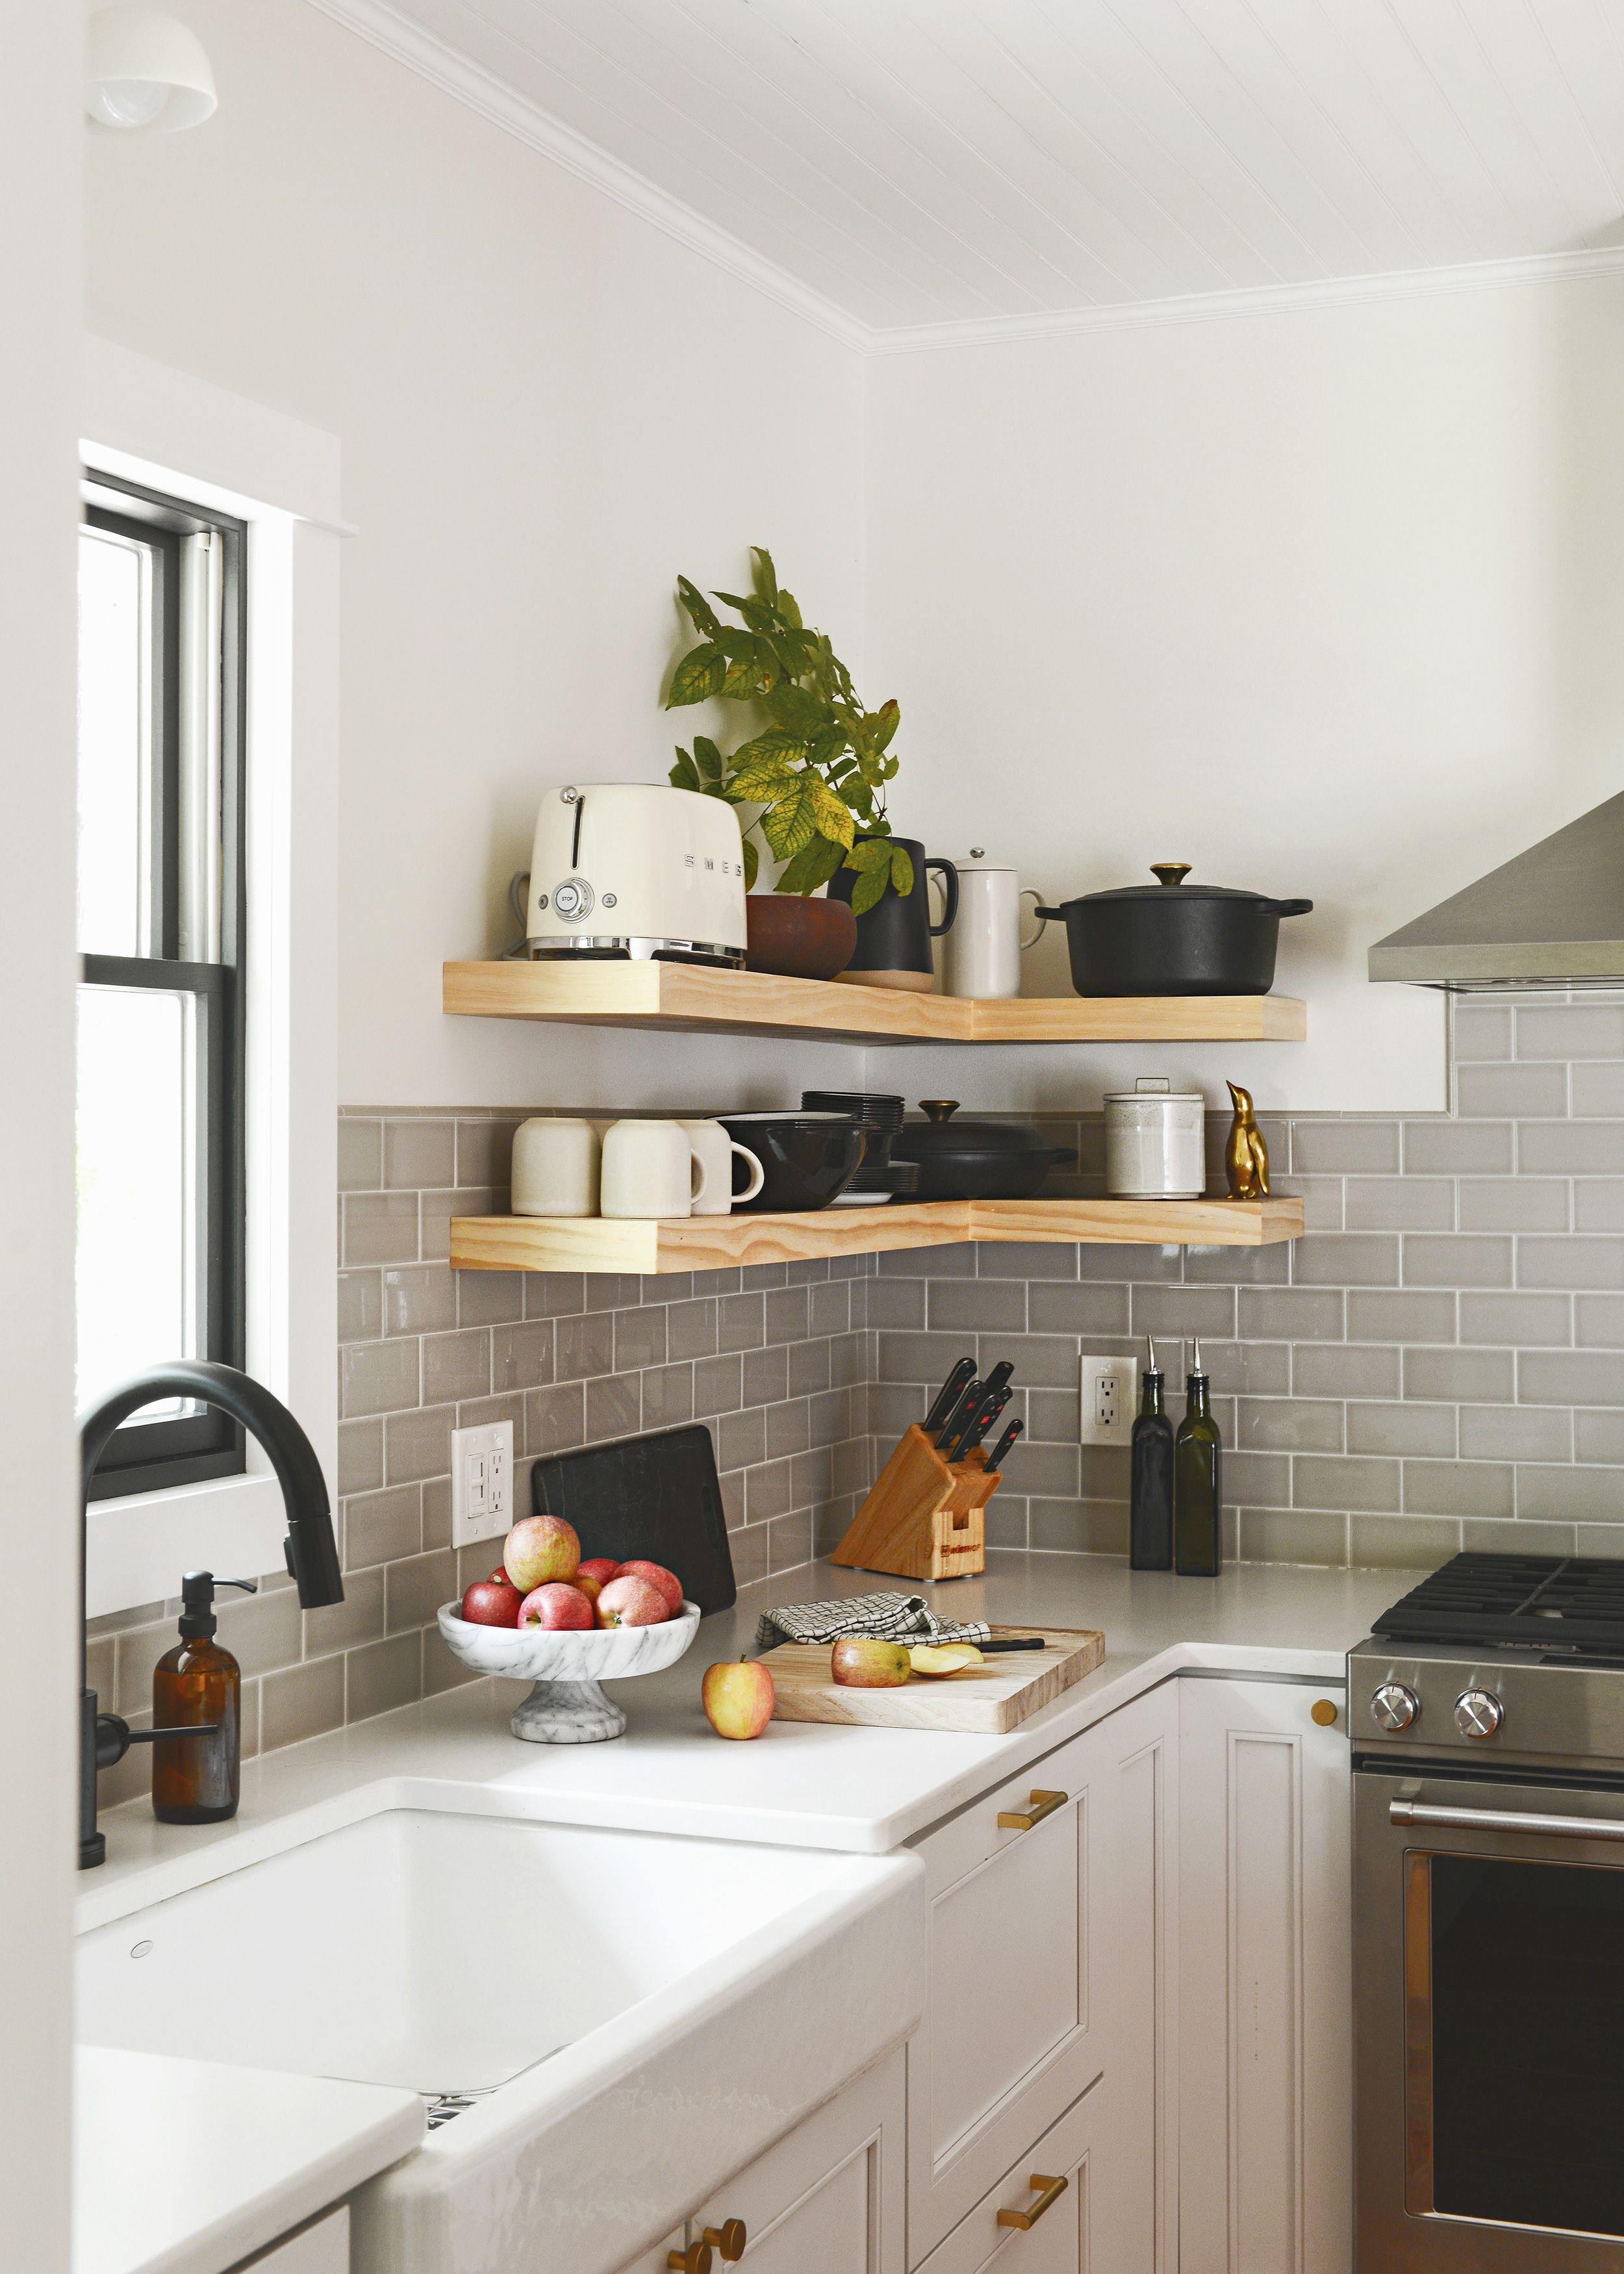 Kitchen Kitchen Open Shelves Ideas Kitchenopenshelvesideas Diy Kitchen Renovation Kitchen Remodel Small Rustic Kitchen